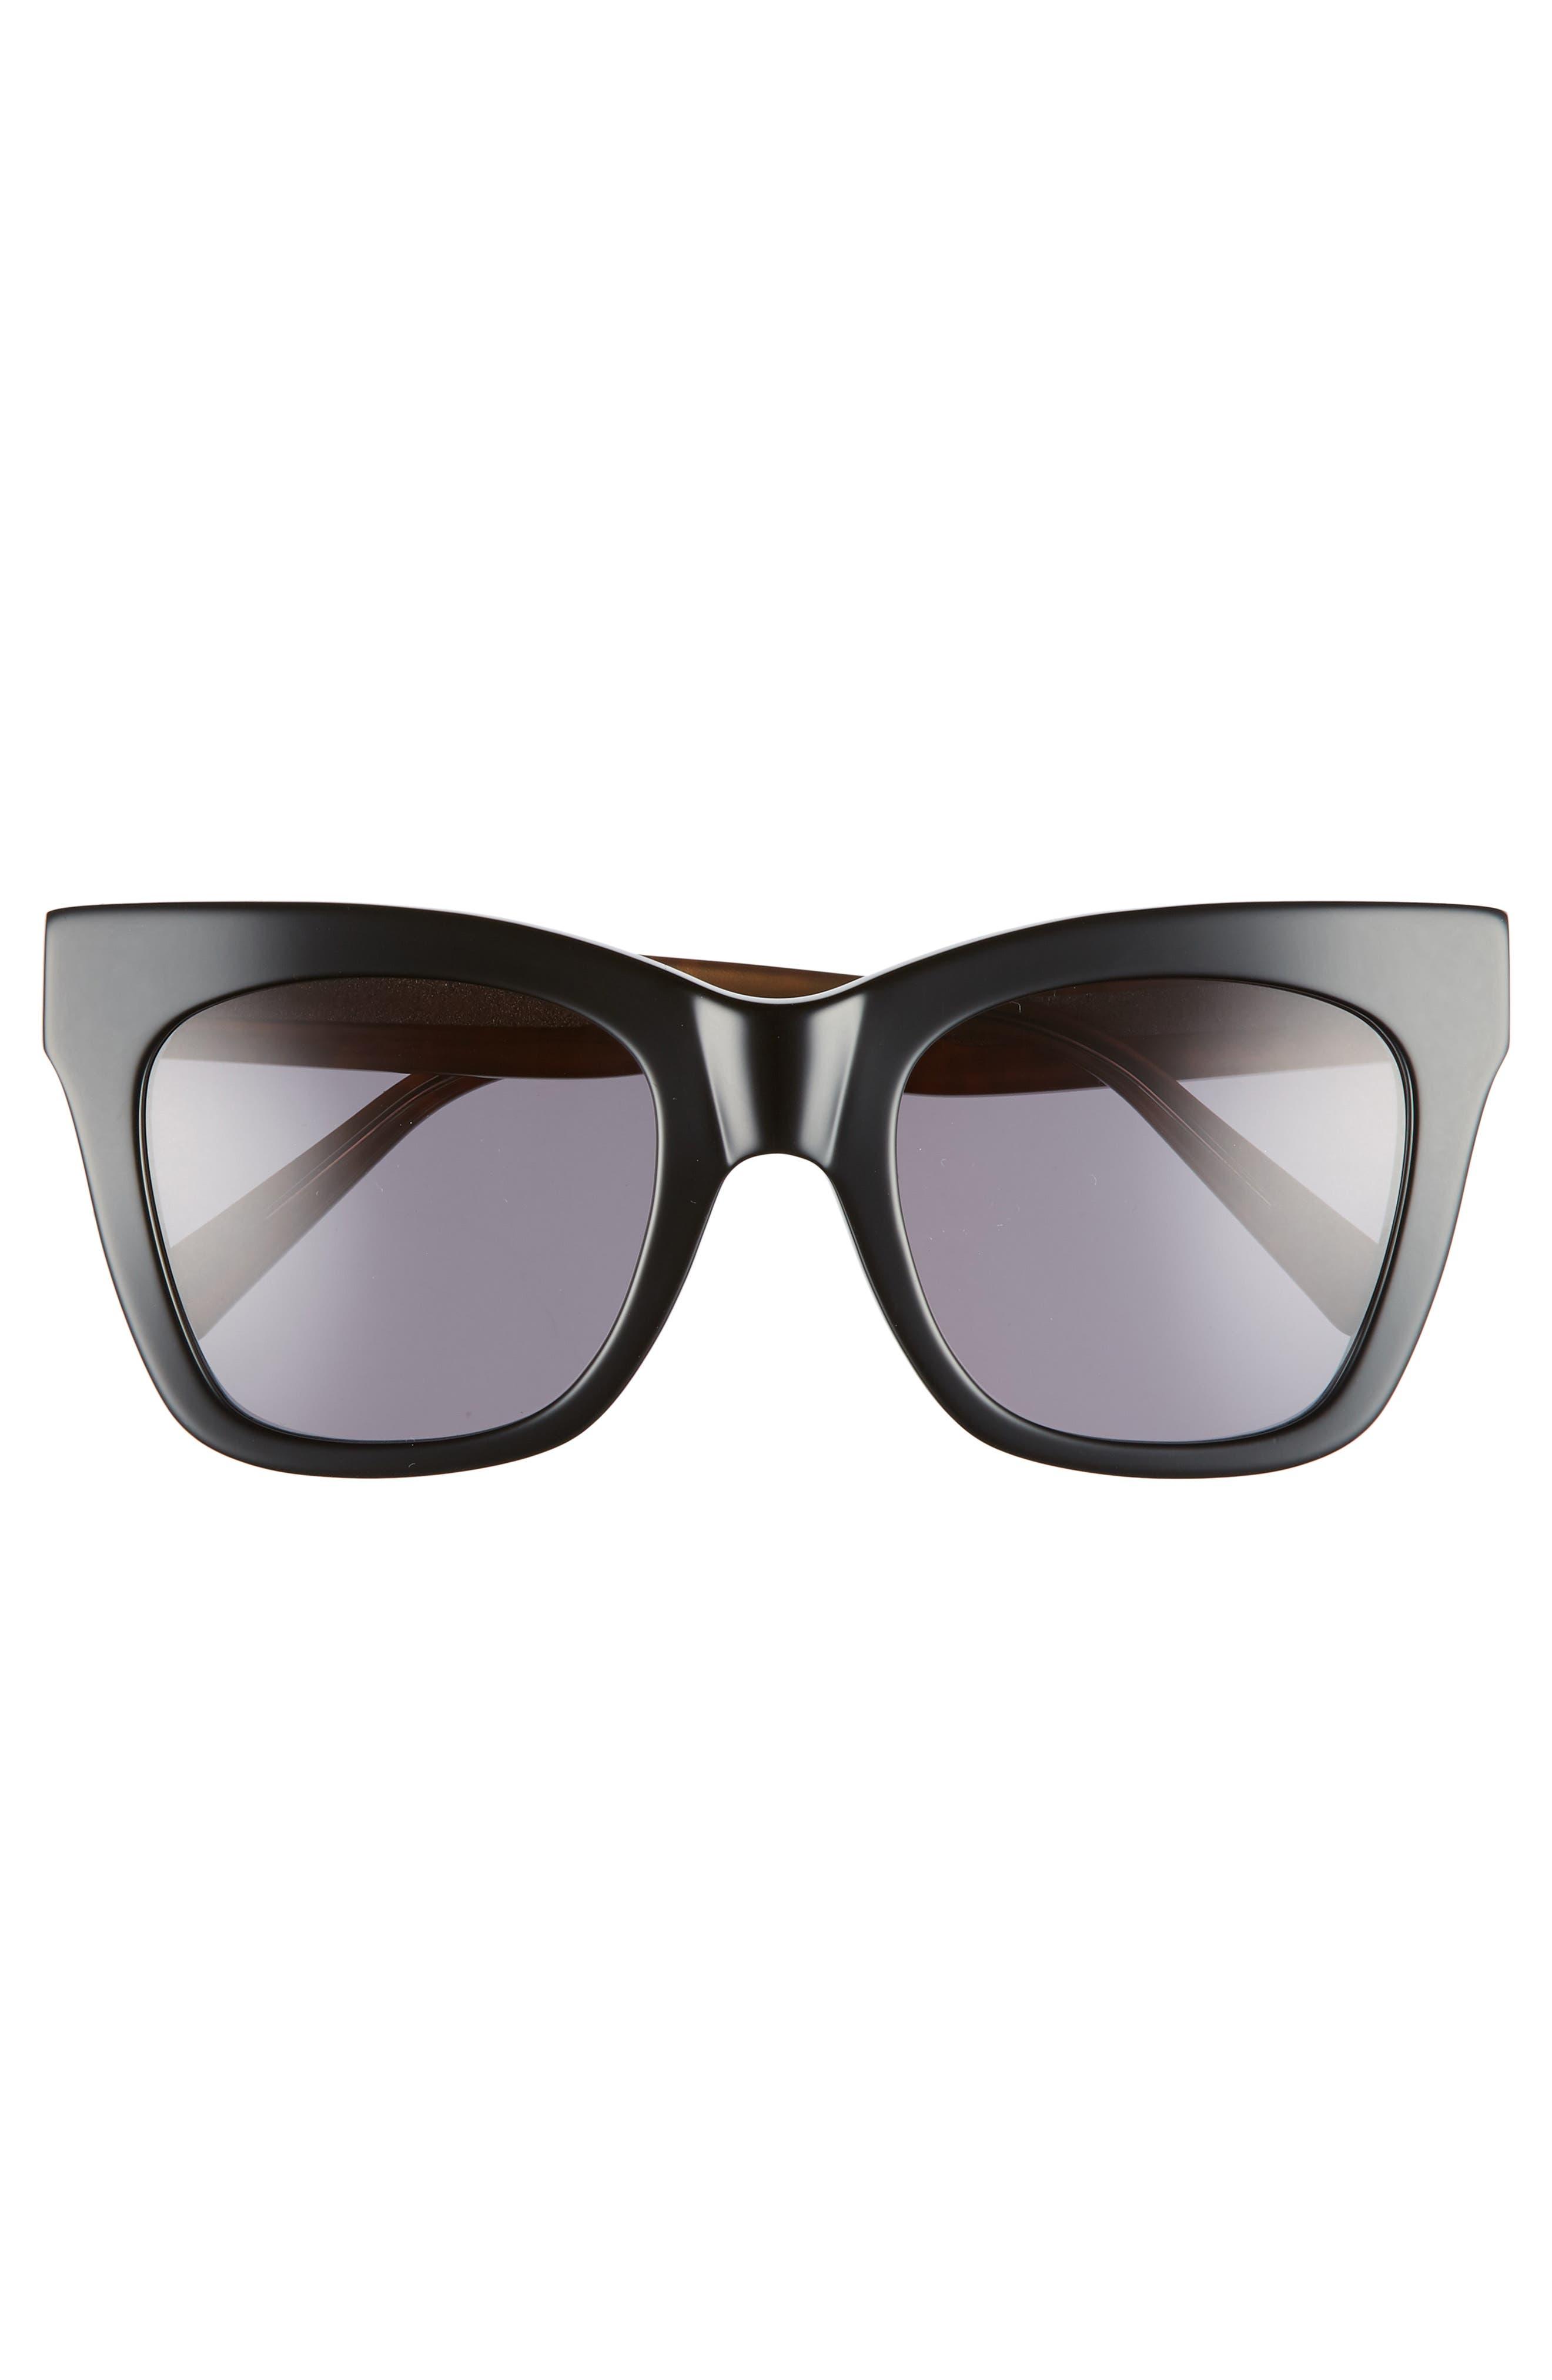 D'BLANC Beach Vida 52mm Sunglasses,                             Alternate thumbnail 3, color,                             BLACK CHEETAH/ GREY